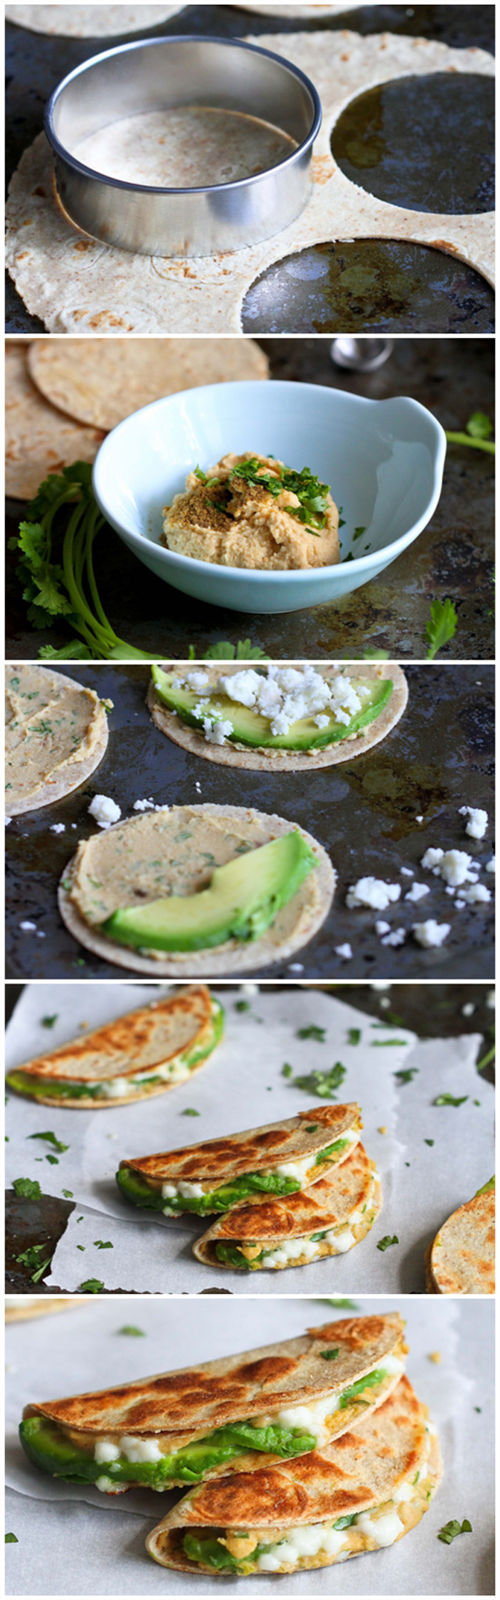 ini Avocado & Hummus Quesadilla Recipe